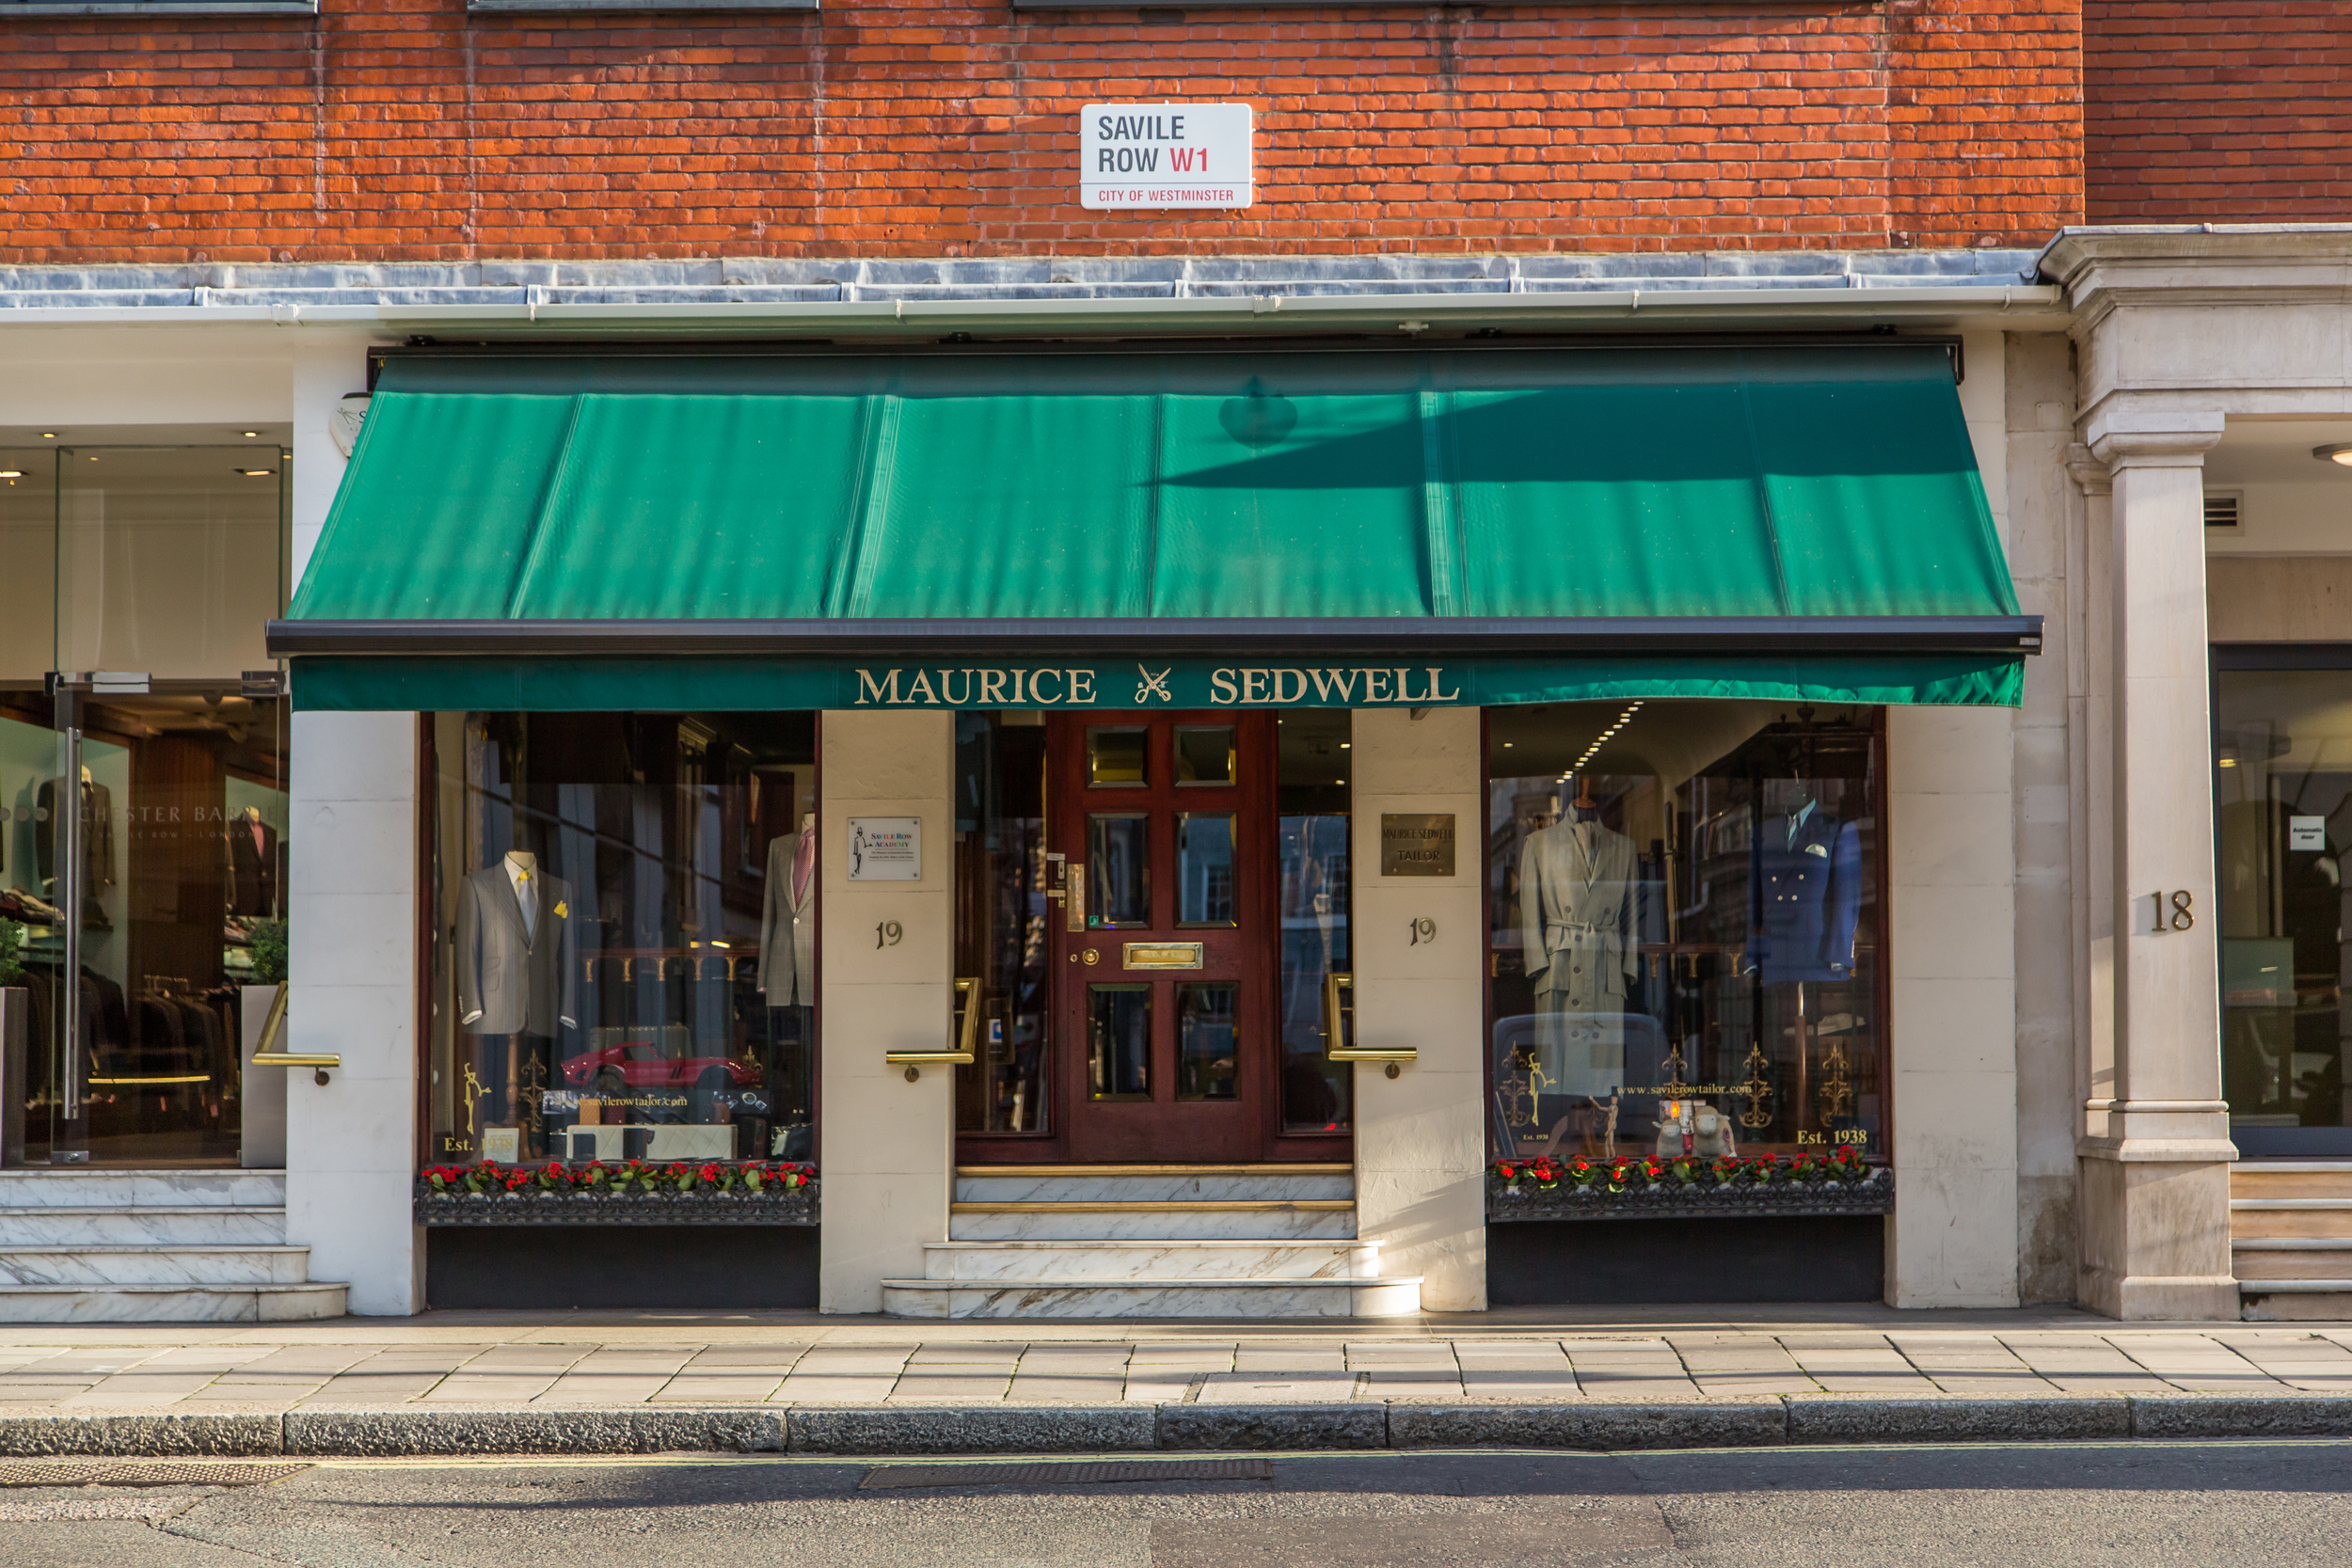 Maurice Sedwell on Savile Row